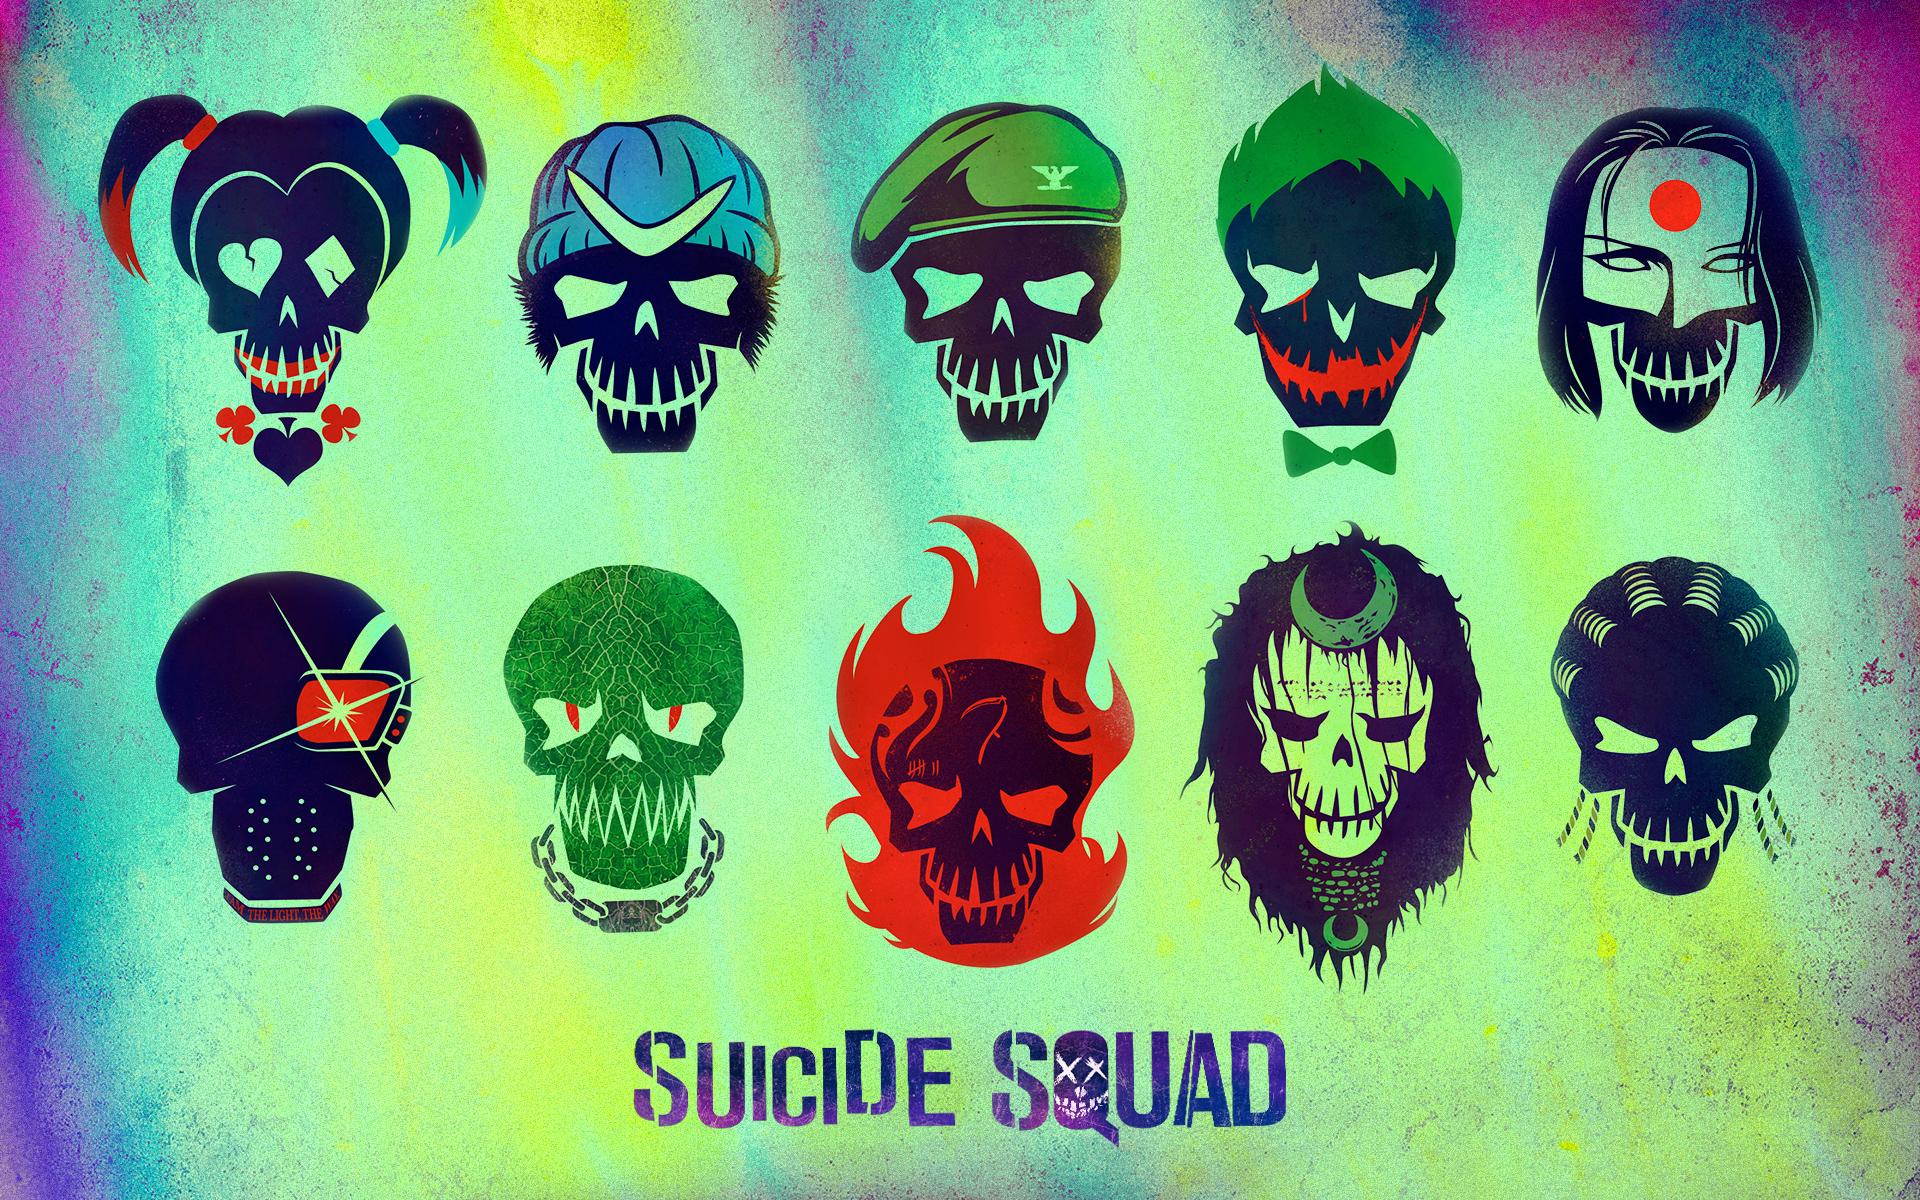 Suicide Squad wallpaper 7 1920x1200